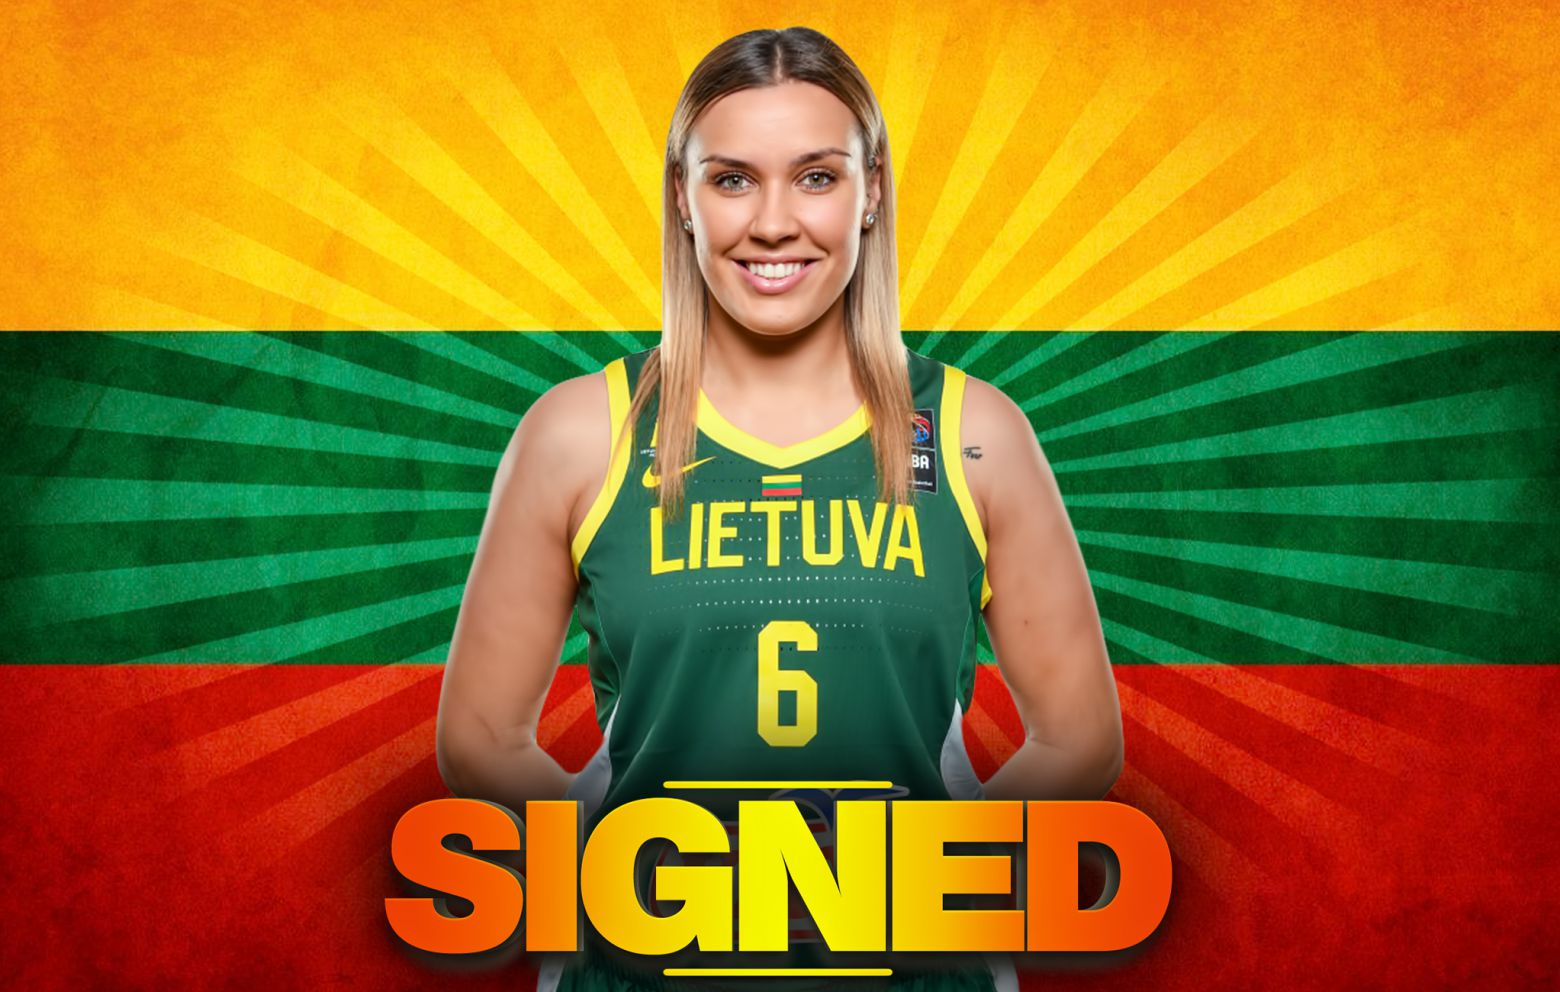 KAMILE NACICKAITE has signed with Regeneracom Sports